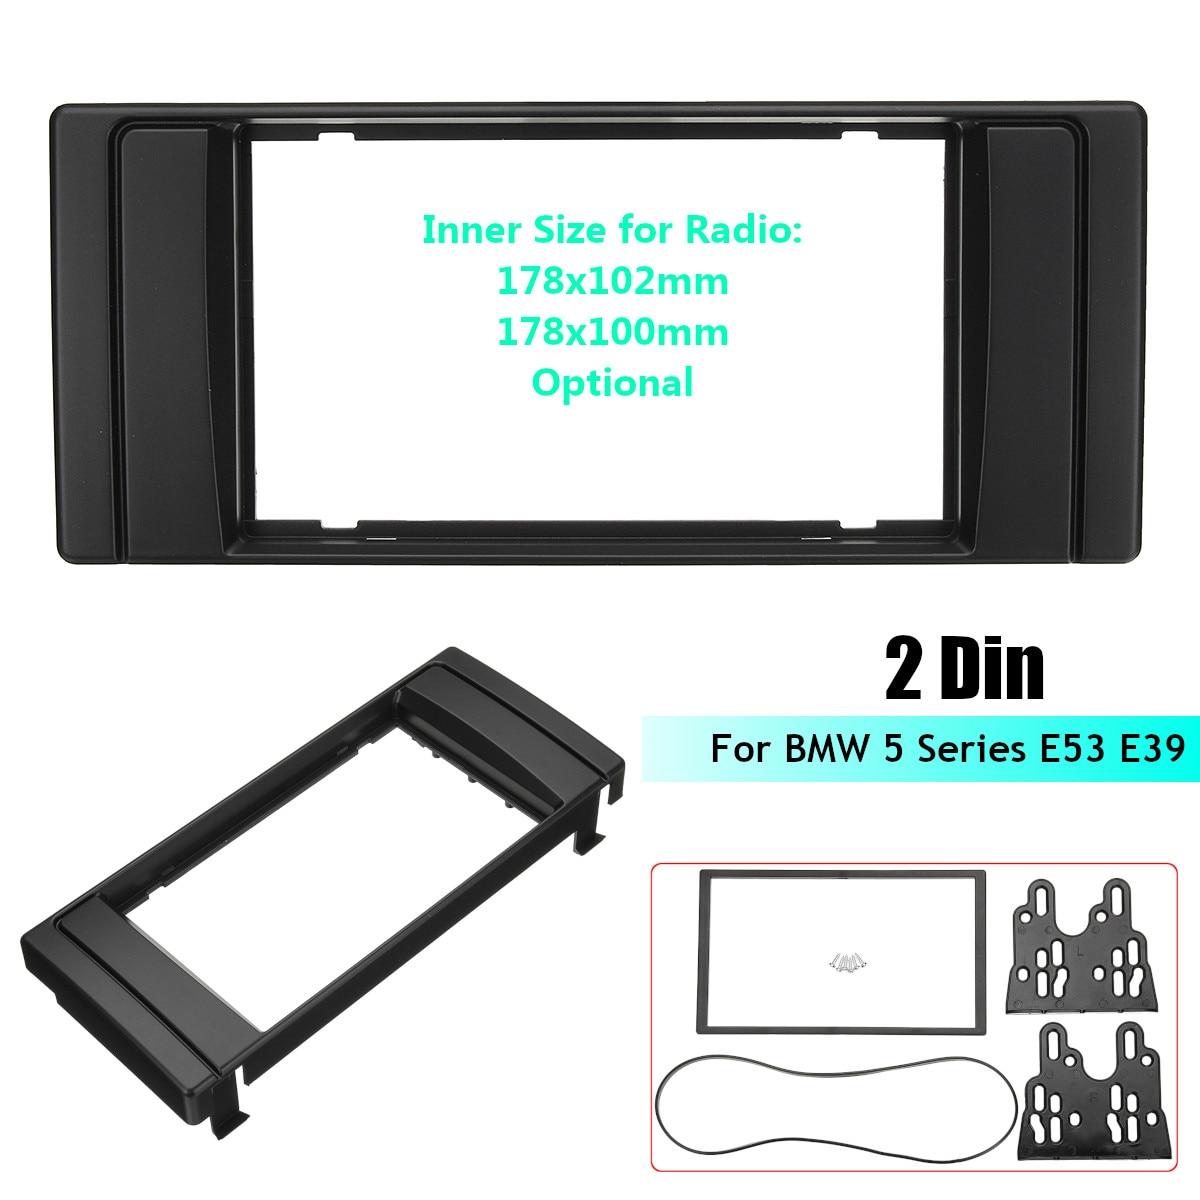 2Din Radio Stereo Fascia Panel Frame Adaptor For SUZUKI Swift 04-09 178*102mm